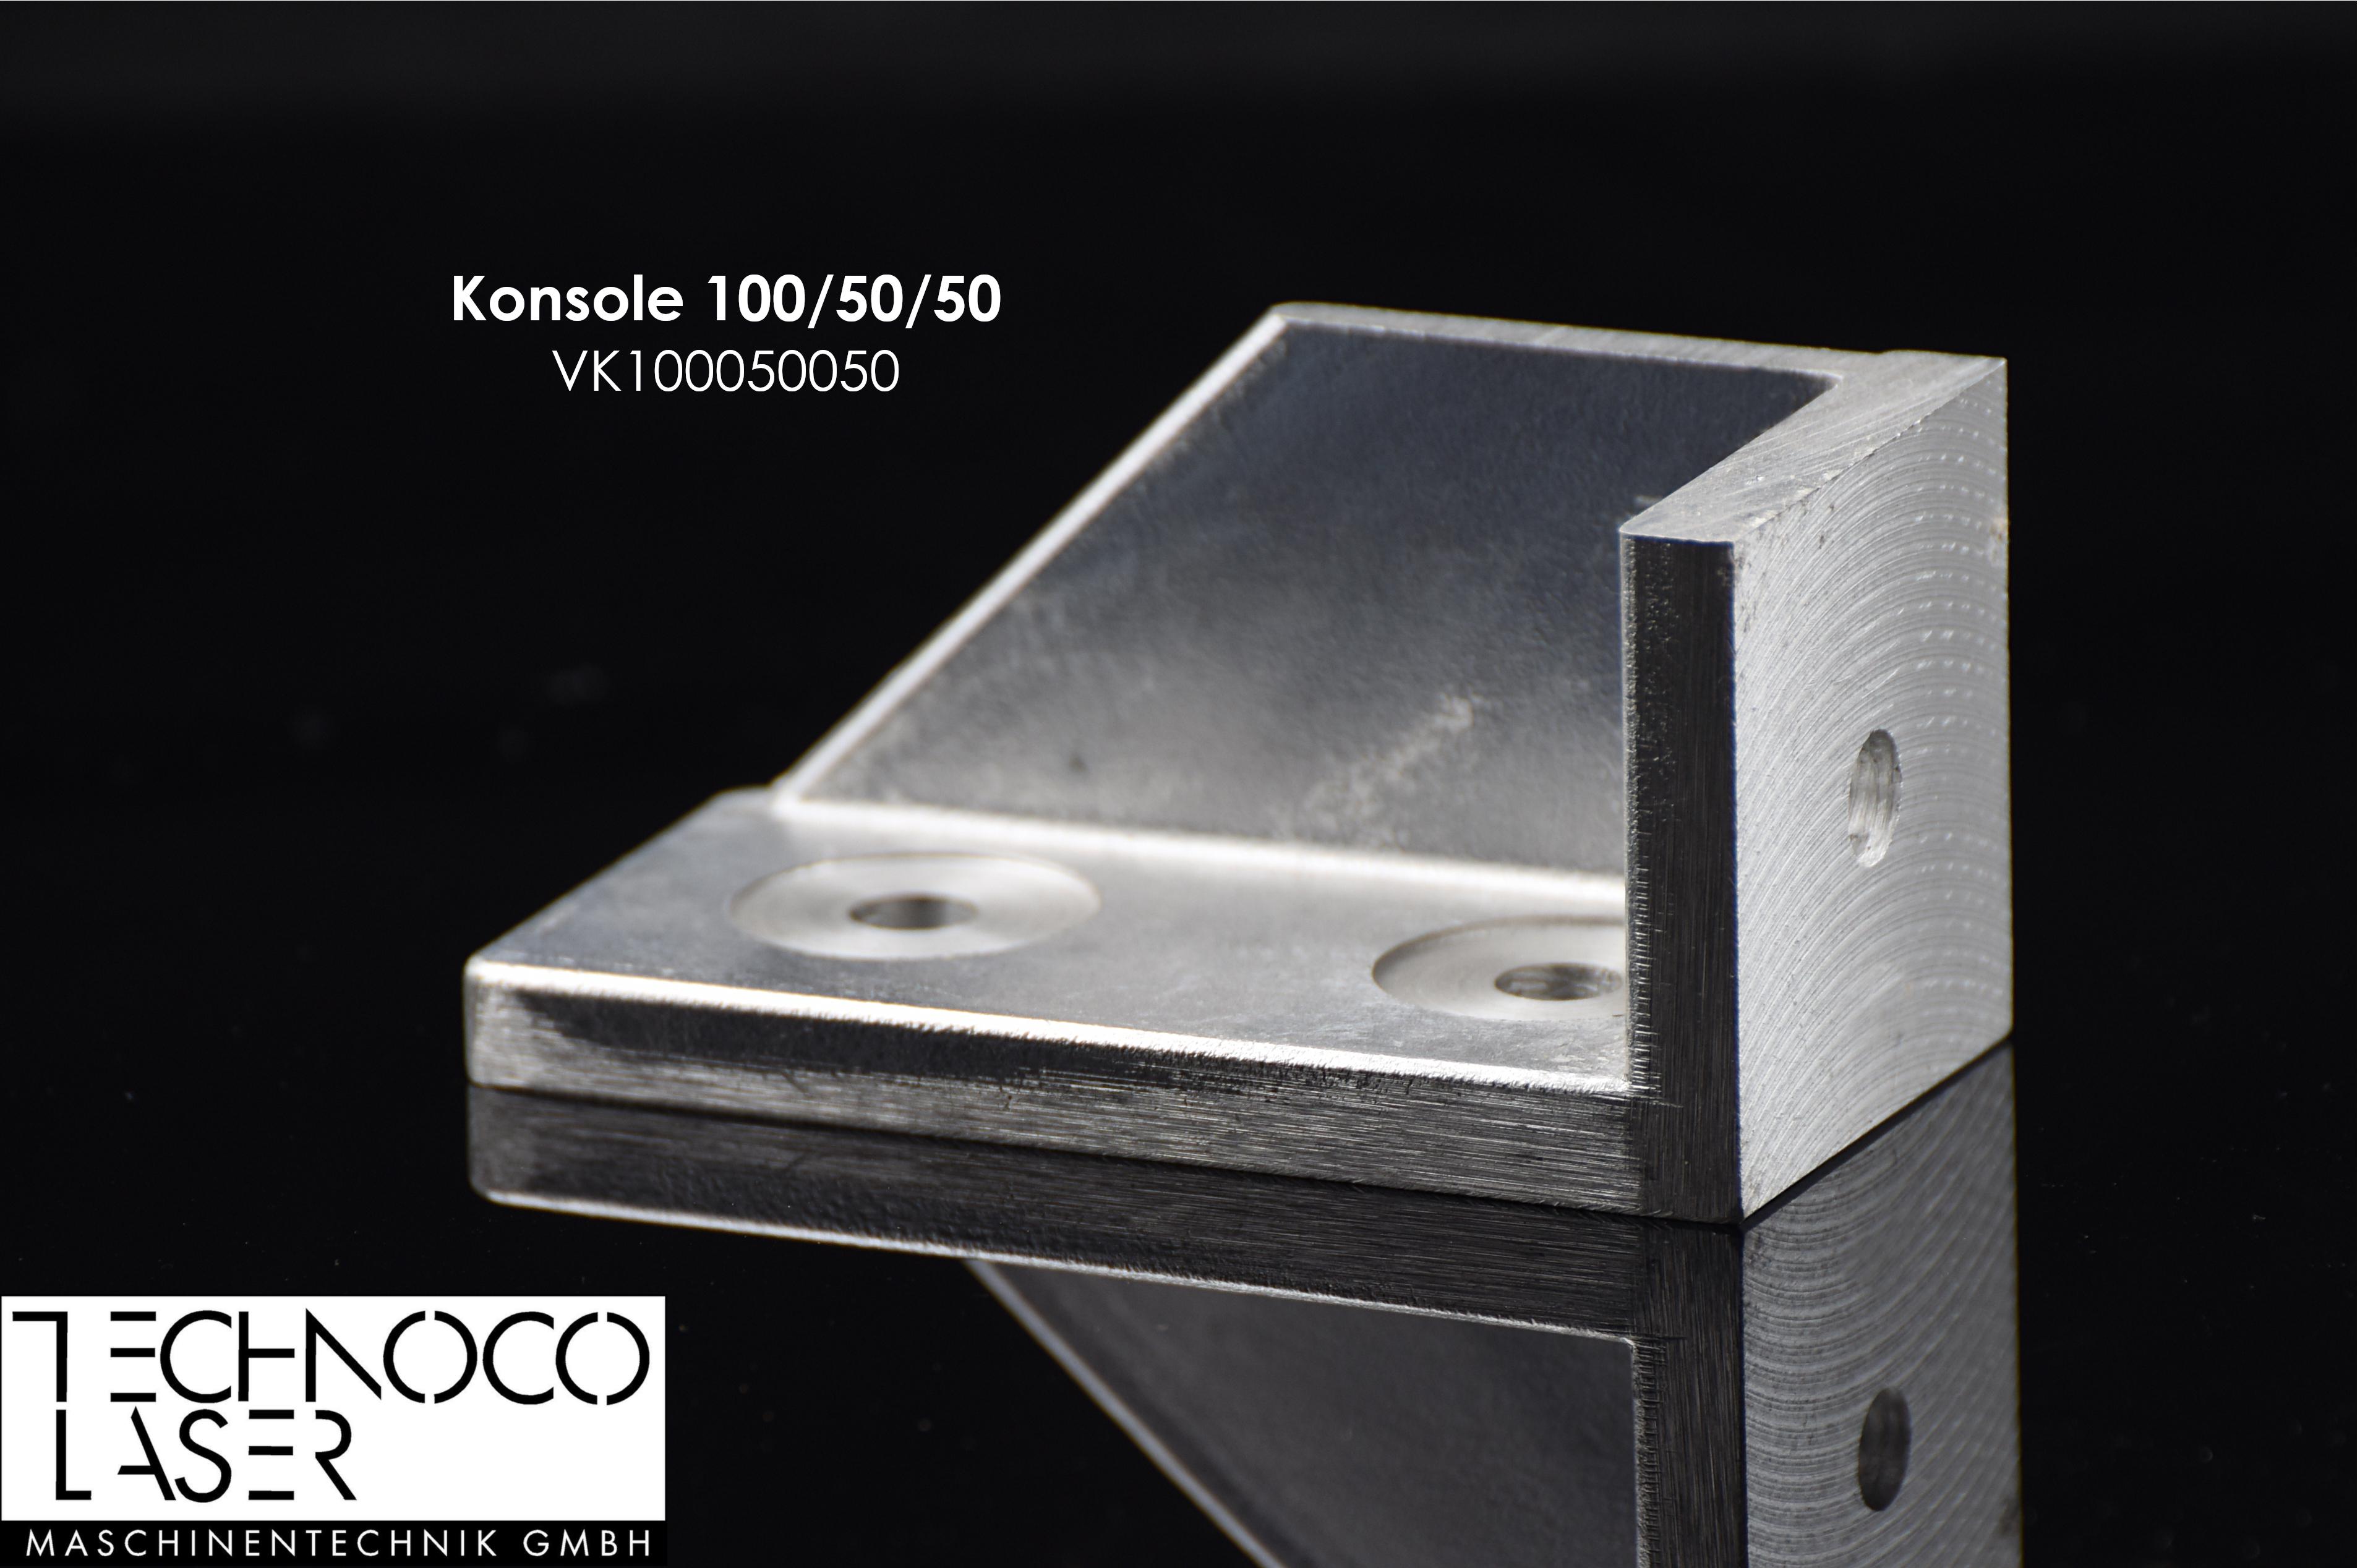 TECO Zubehör I Konsole 100/50/50